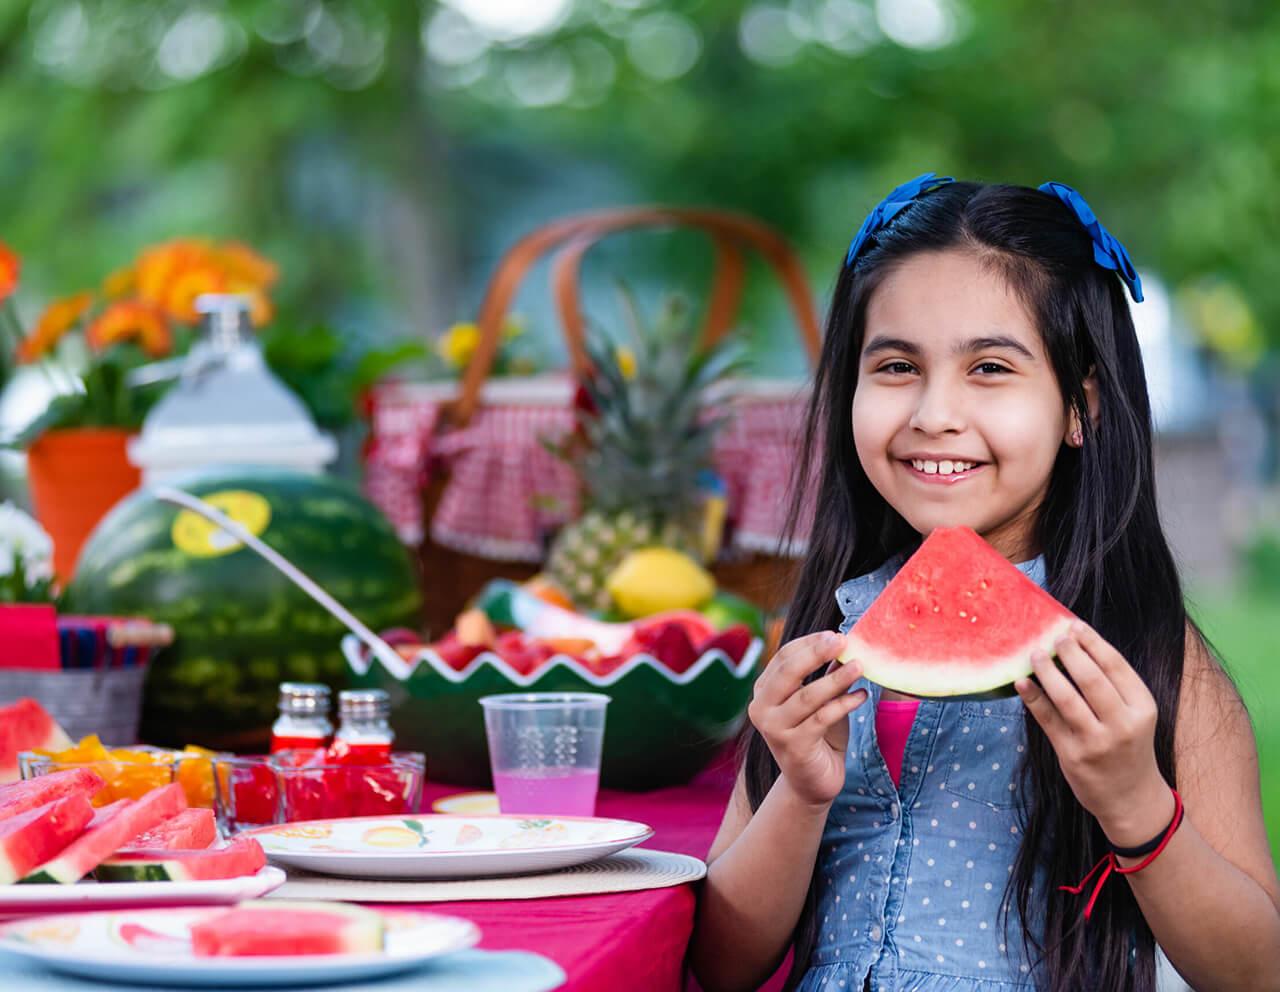 Kids Choice Watermelons Gallery little girl loving watermelon